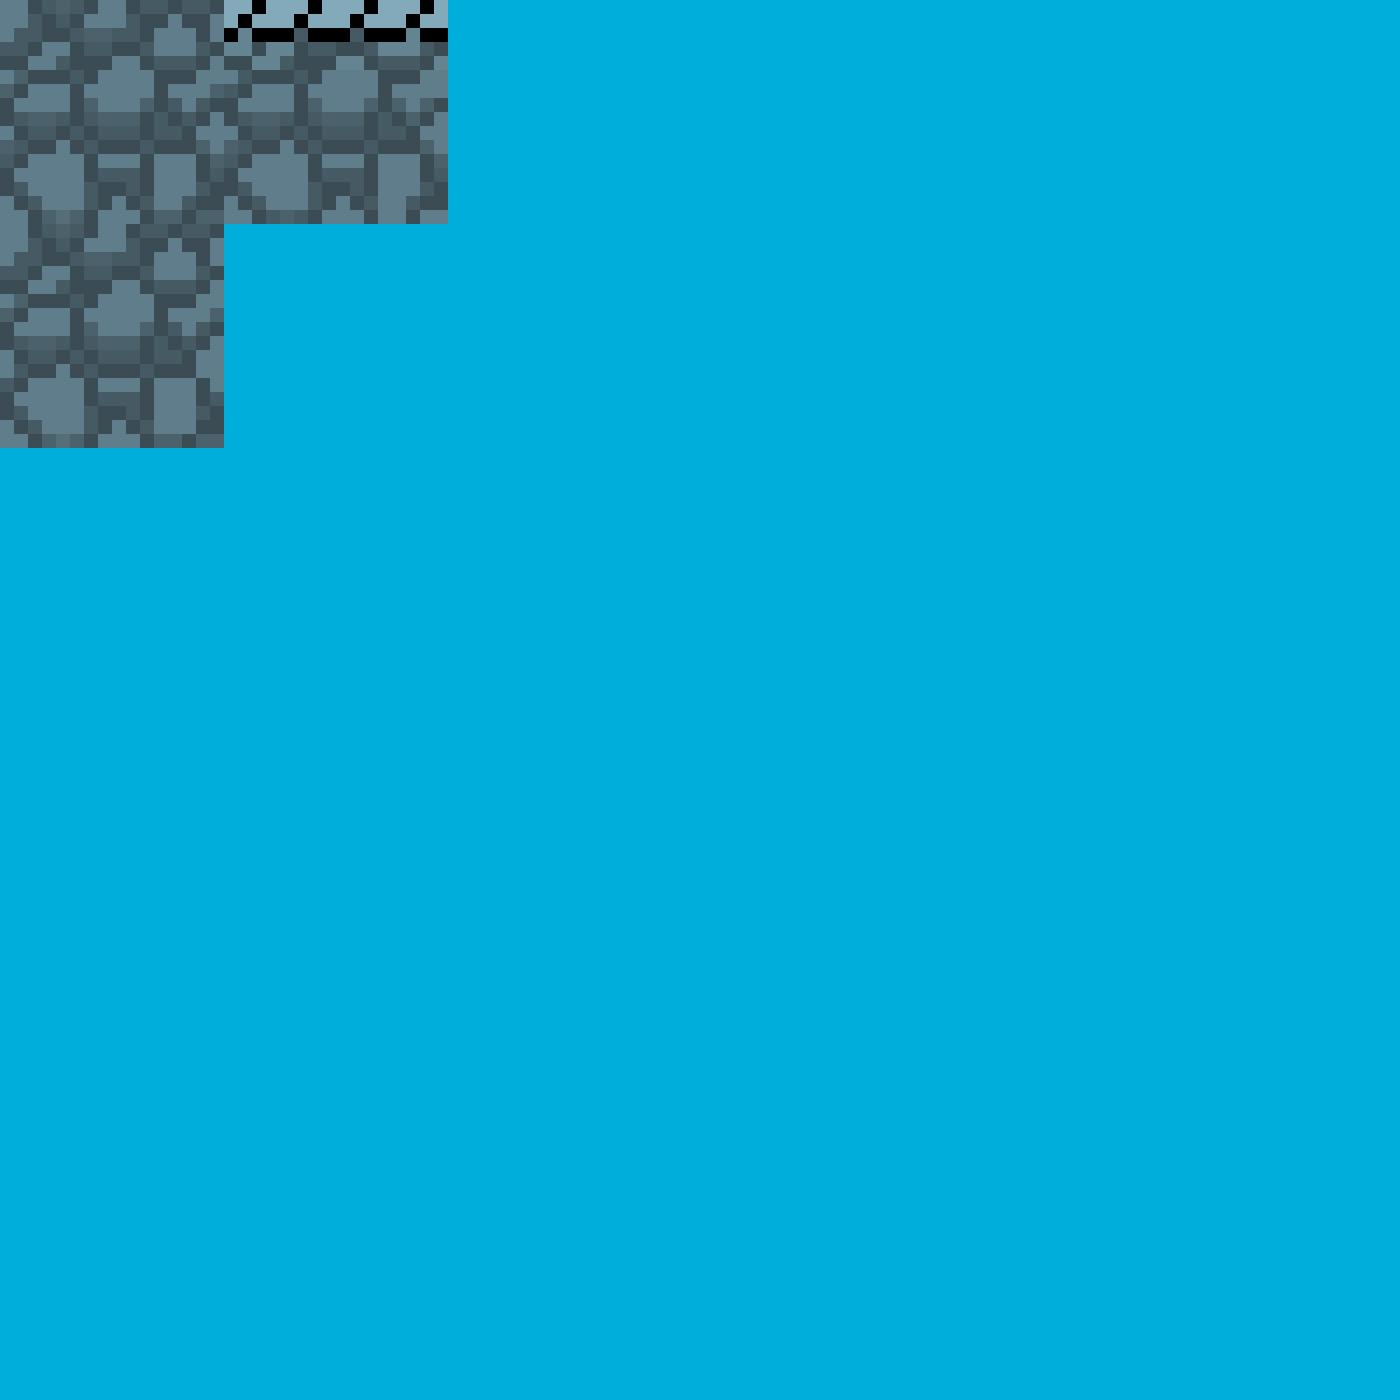 Pixilart - Pixel art Tiles (cobblestone) by Anonymous